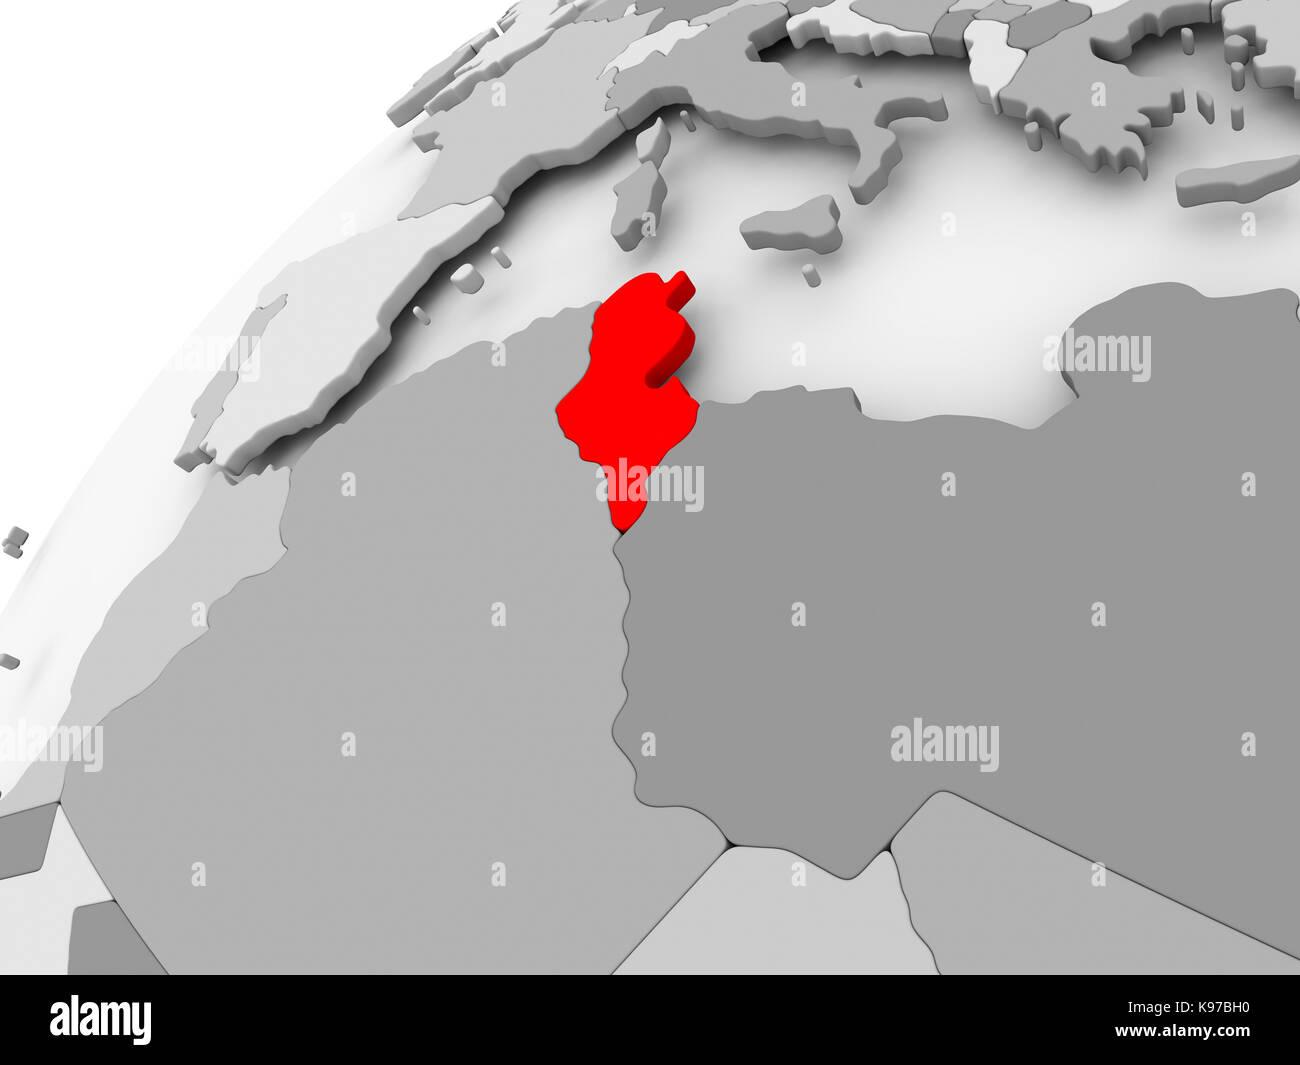 Tunesien Karte Welt.Tunisian Map Stockfotos Tunisian Map Bilder Seite 2 Alamy